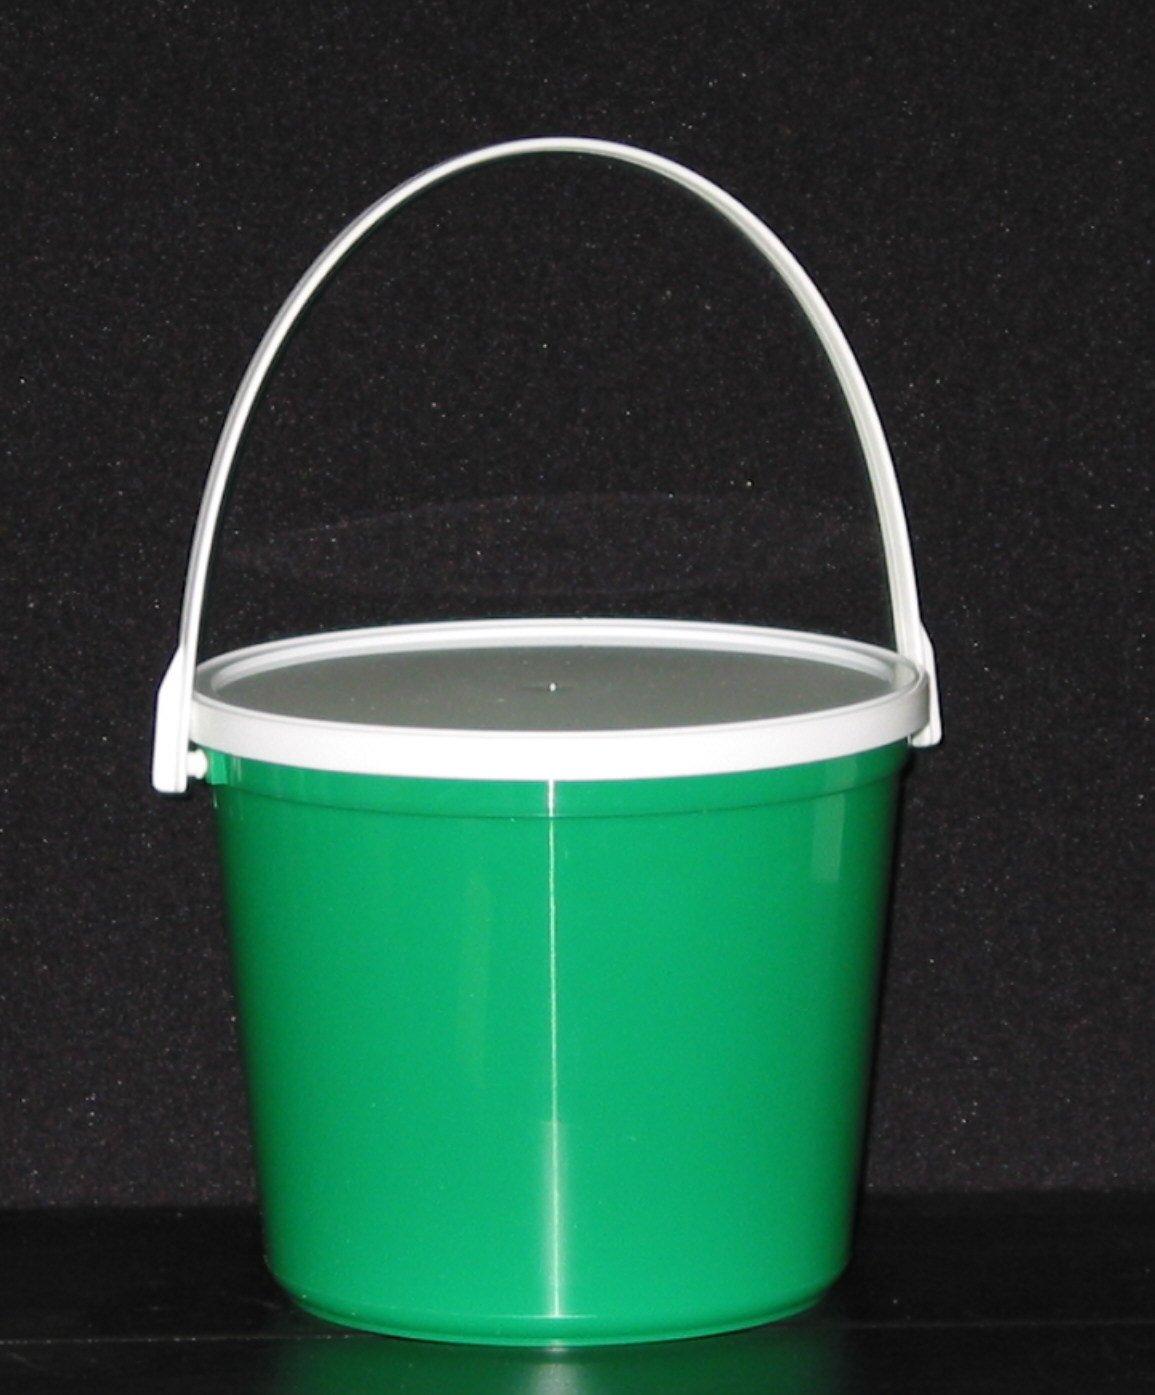 Plastic Buckets & Lids, 80 Ounces, 6 Pack,1 each Red Blue Yellow Orange Purple & Green by Talisman (Image #4)